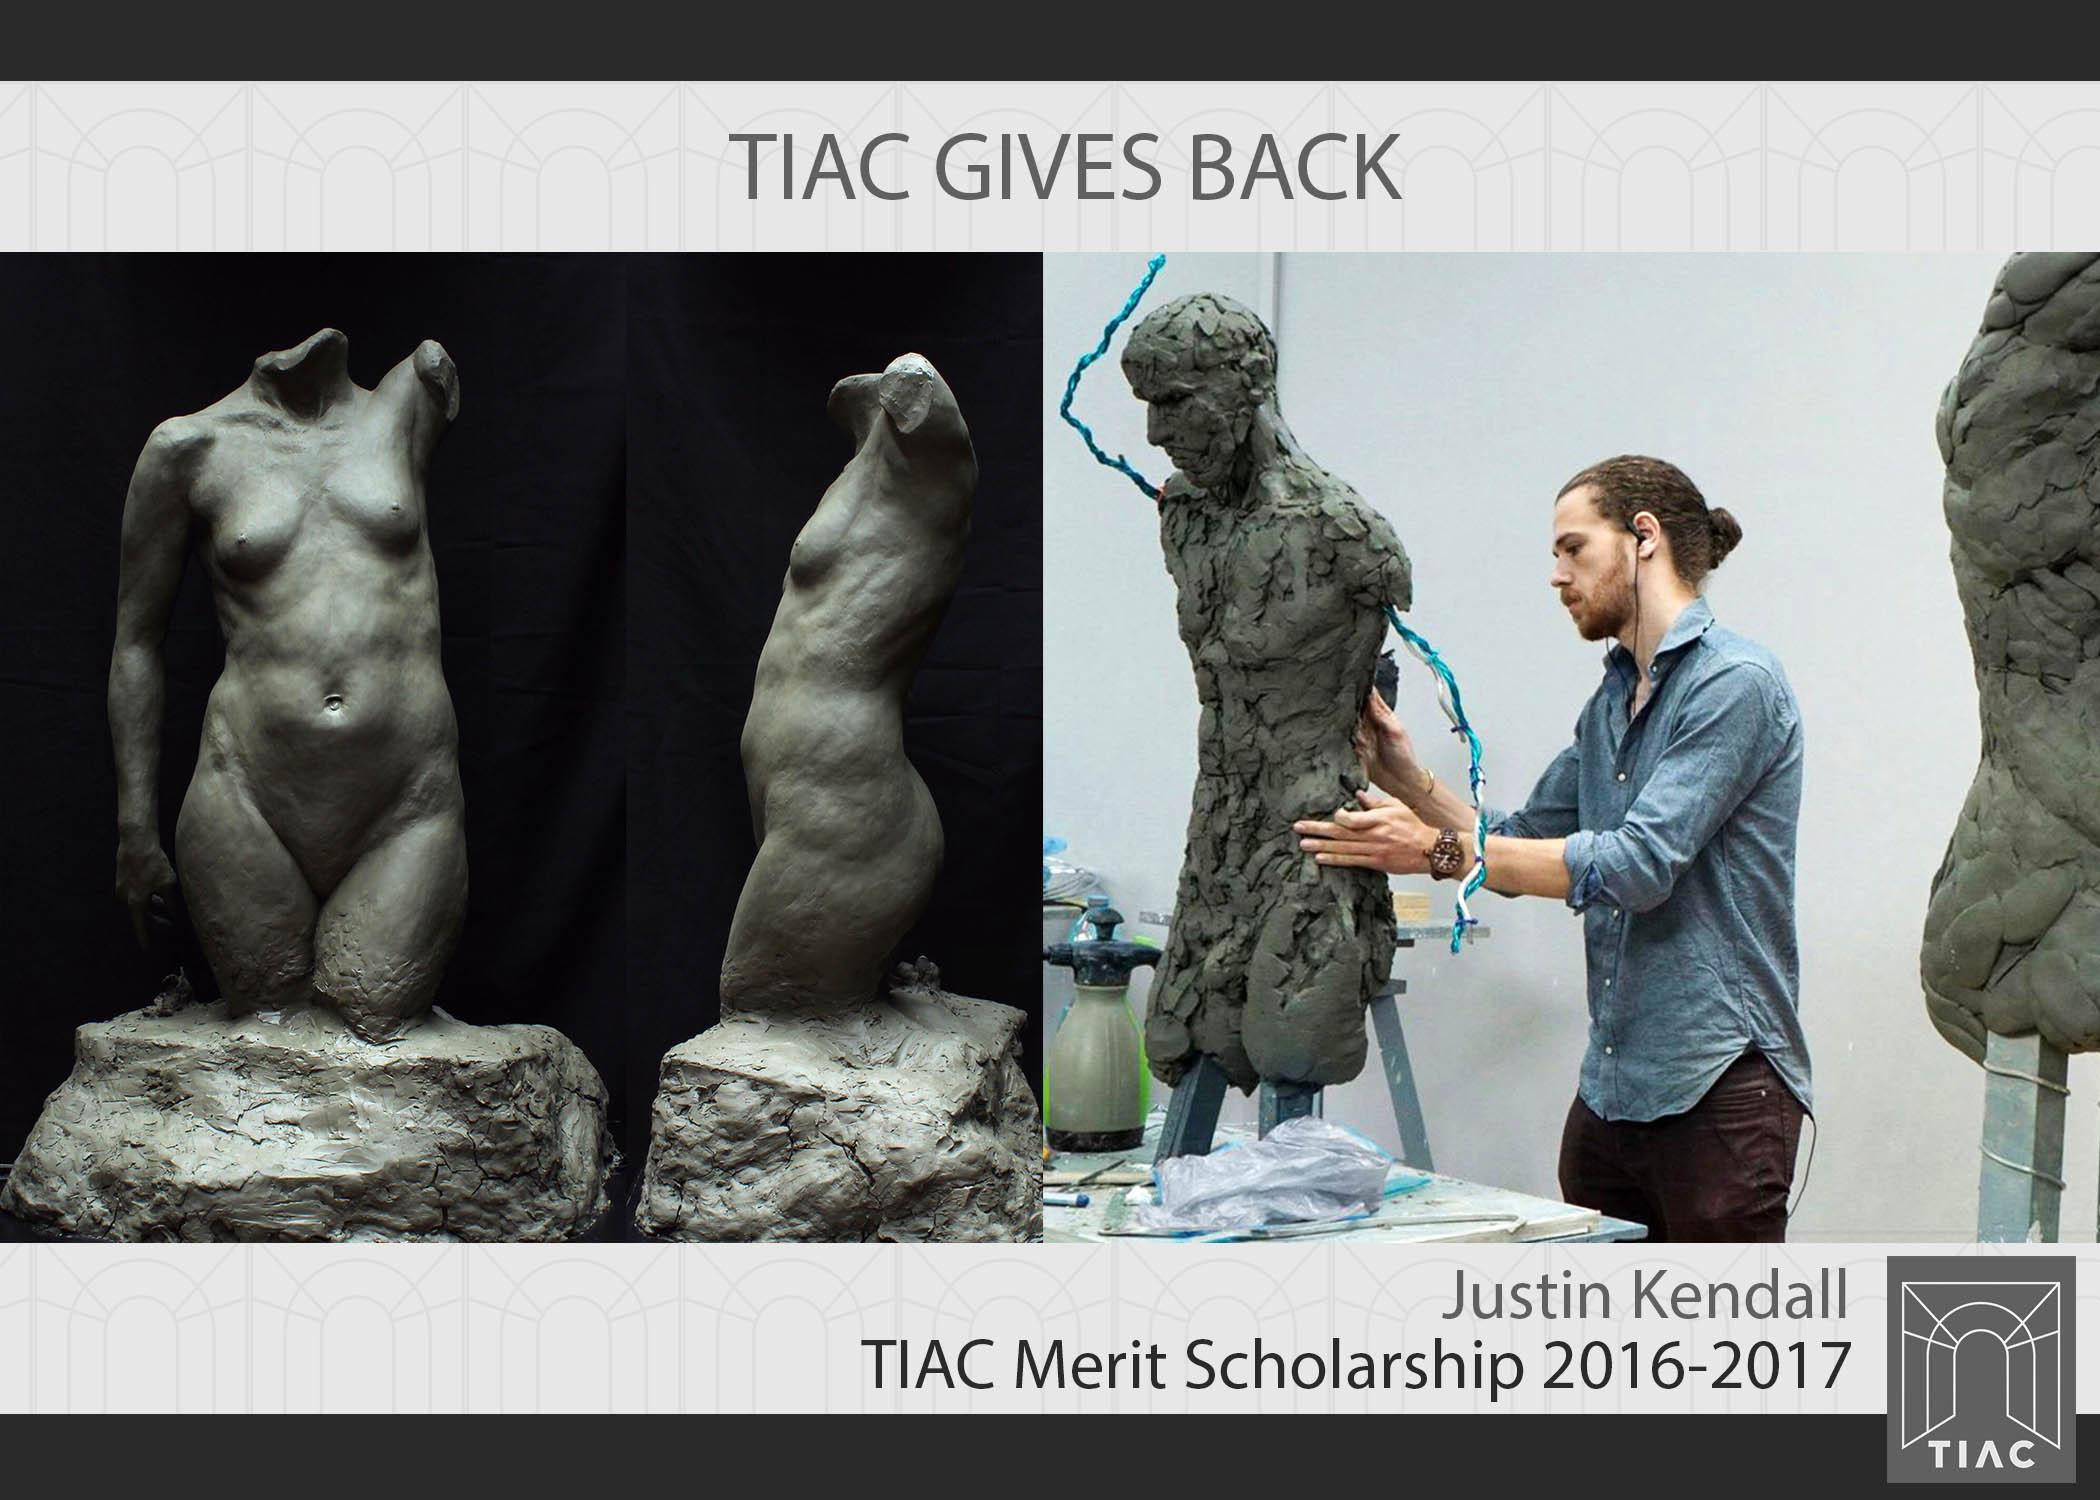 TIAc-Gives_Back_Scholarships-Justin Kendall.jpg